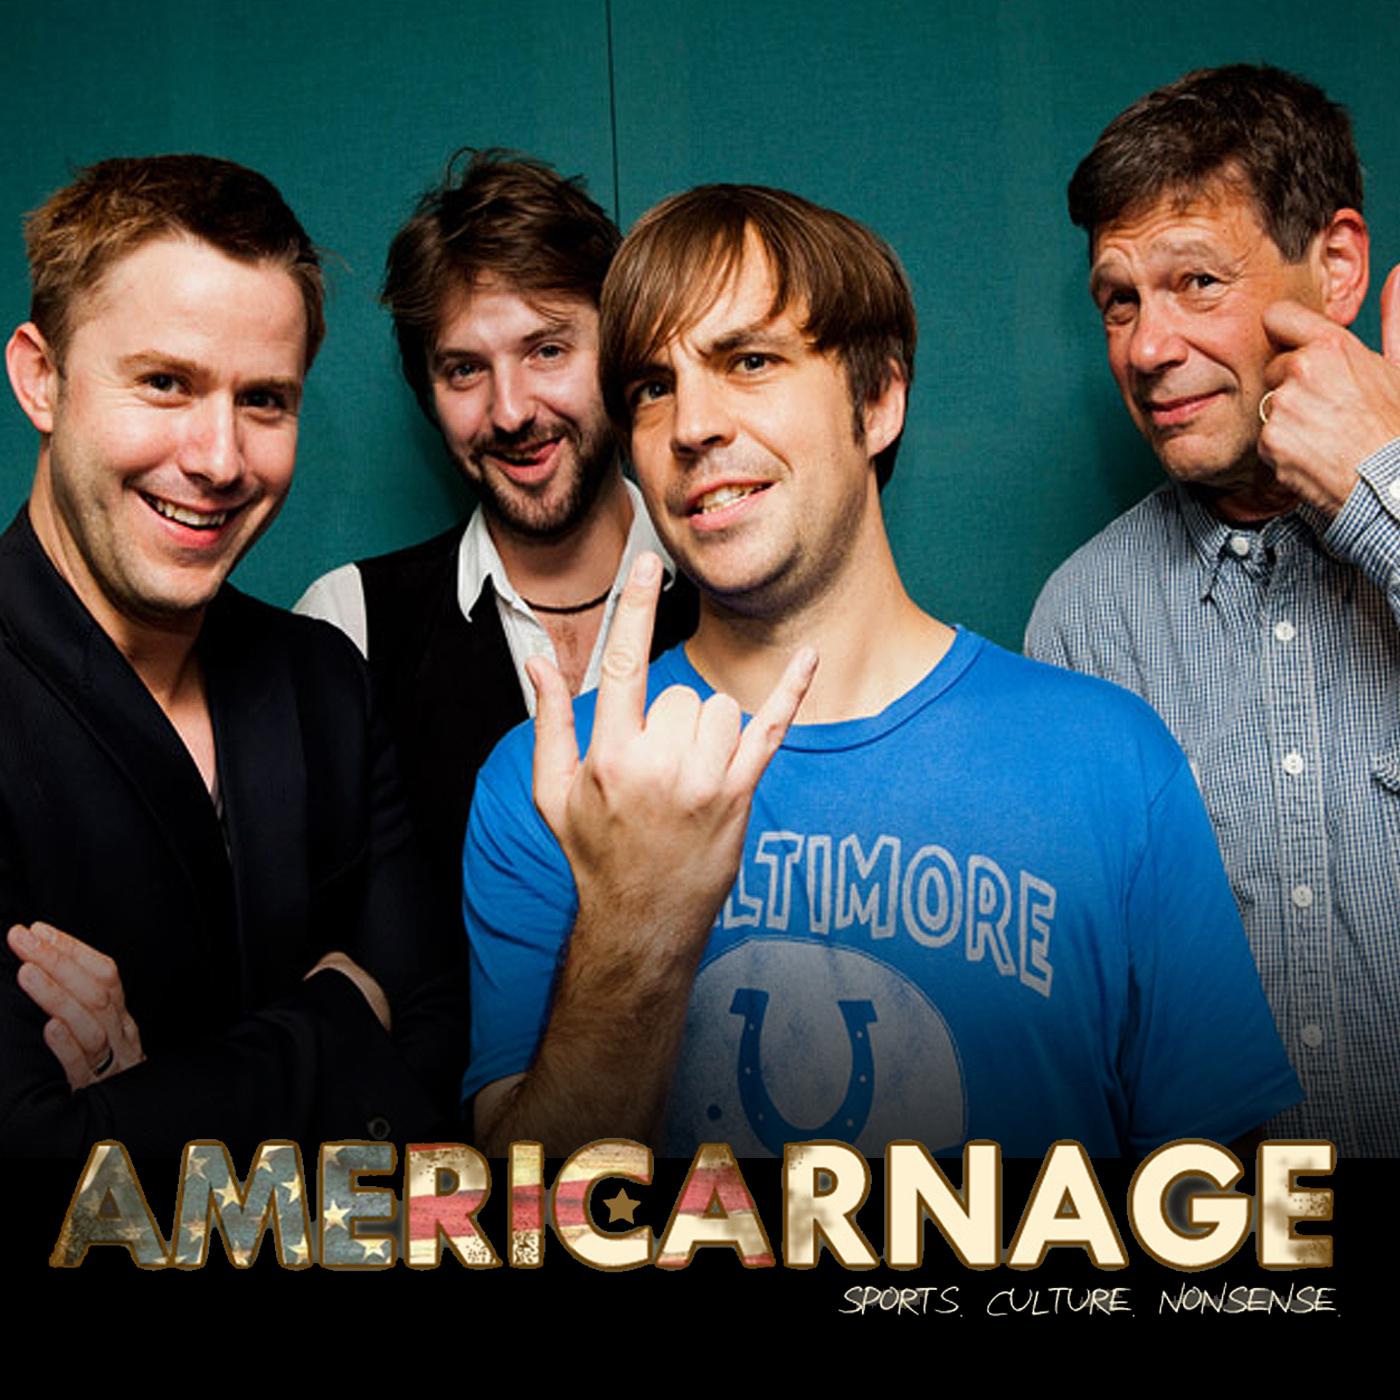 Americarnage